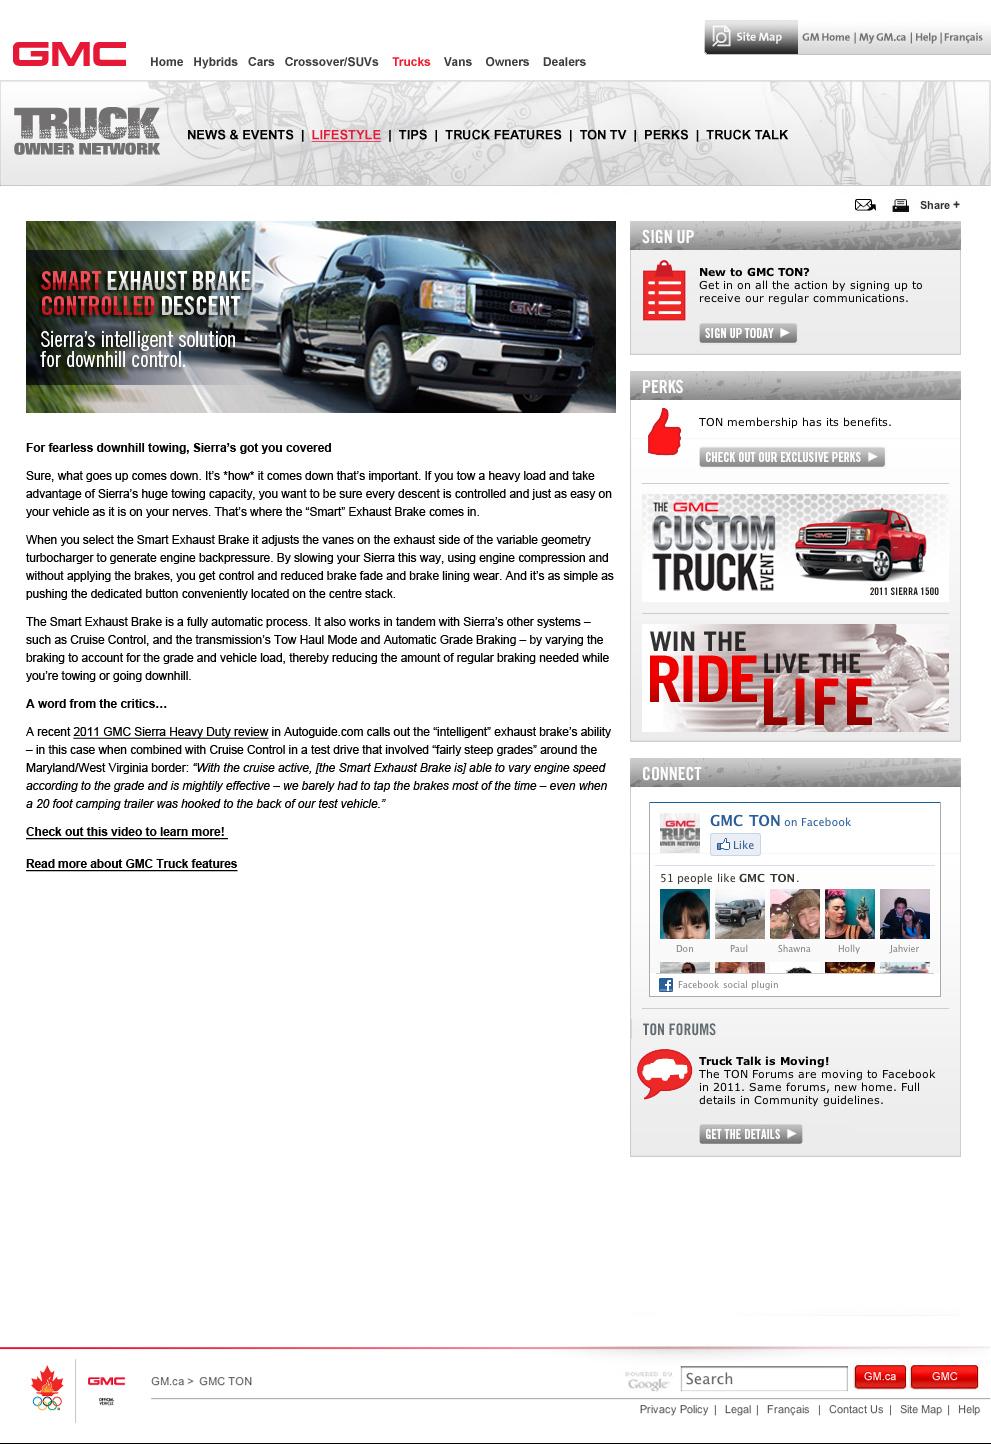 DEC_GMC_TON_SmartExhaust_E.jpg